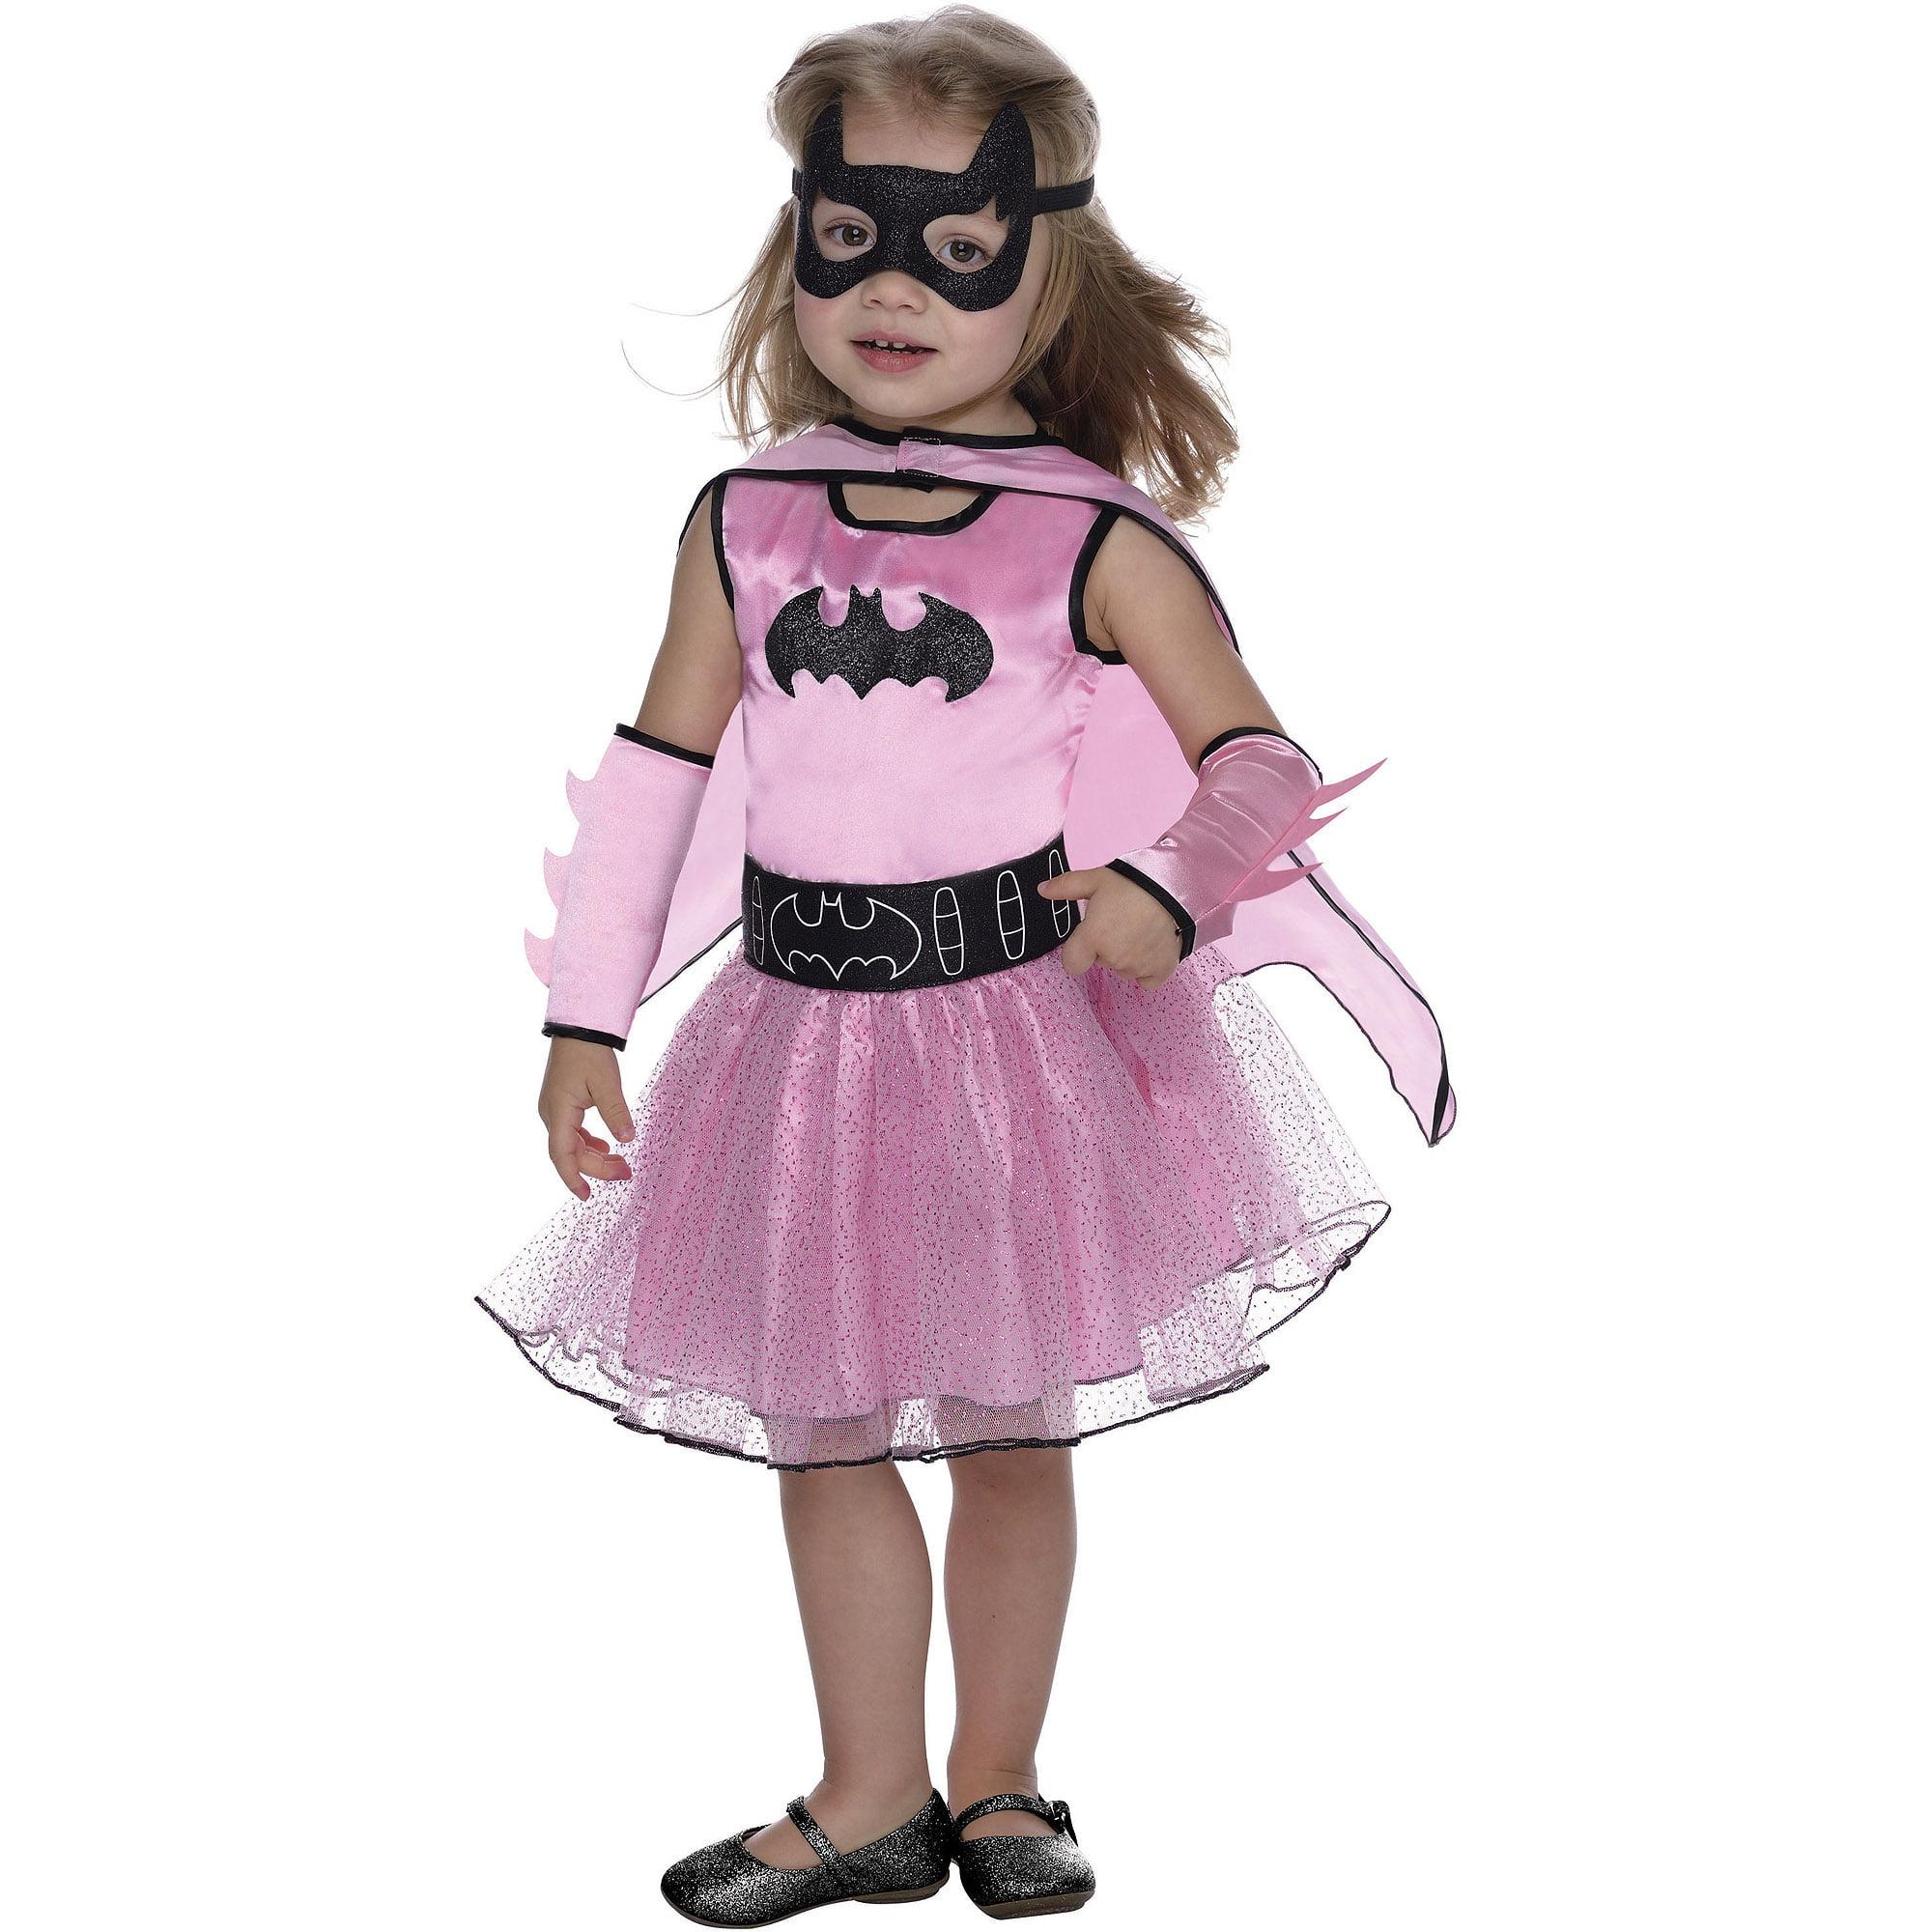 sc 1 st  Walmart & Halloween Pnk Batgirl 2t - Walmart.com